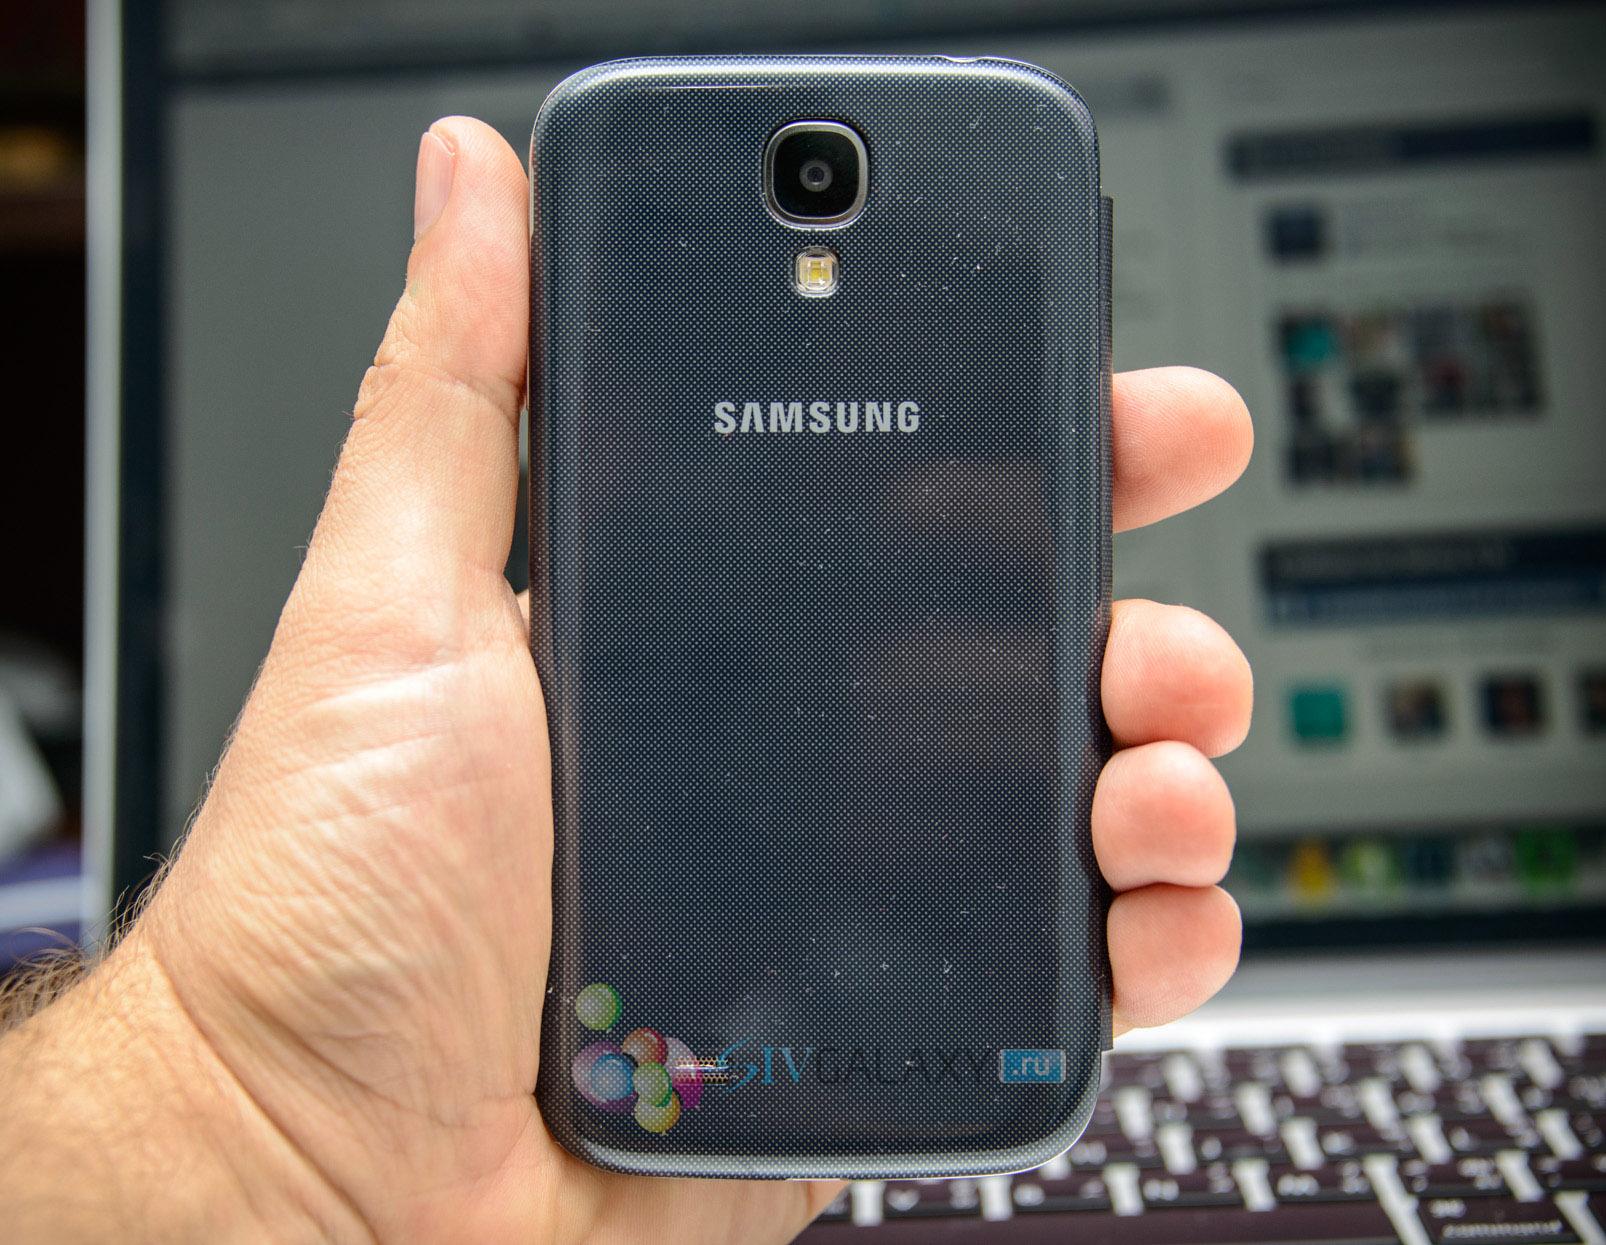 S View Cover для Samsung Galaxy S4 - задняя панель